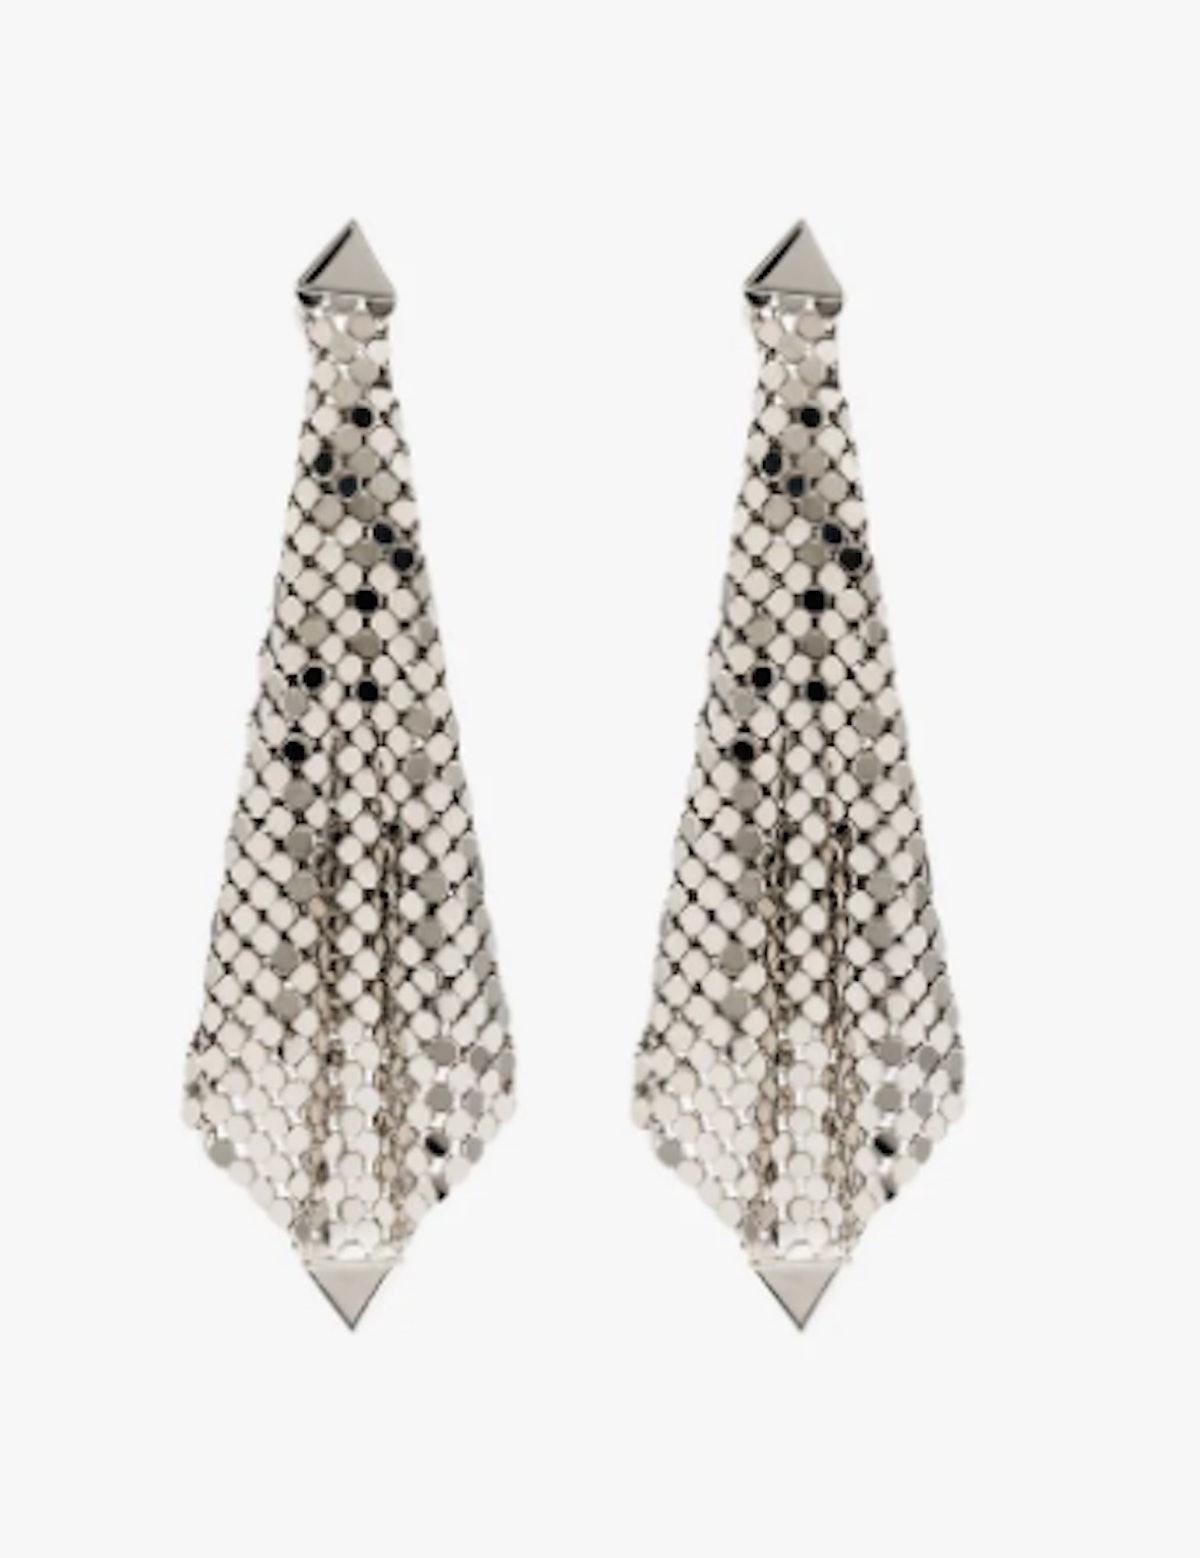 Silver Tone Chain Mesh Drape Earrings